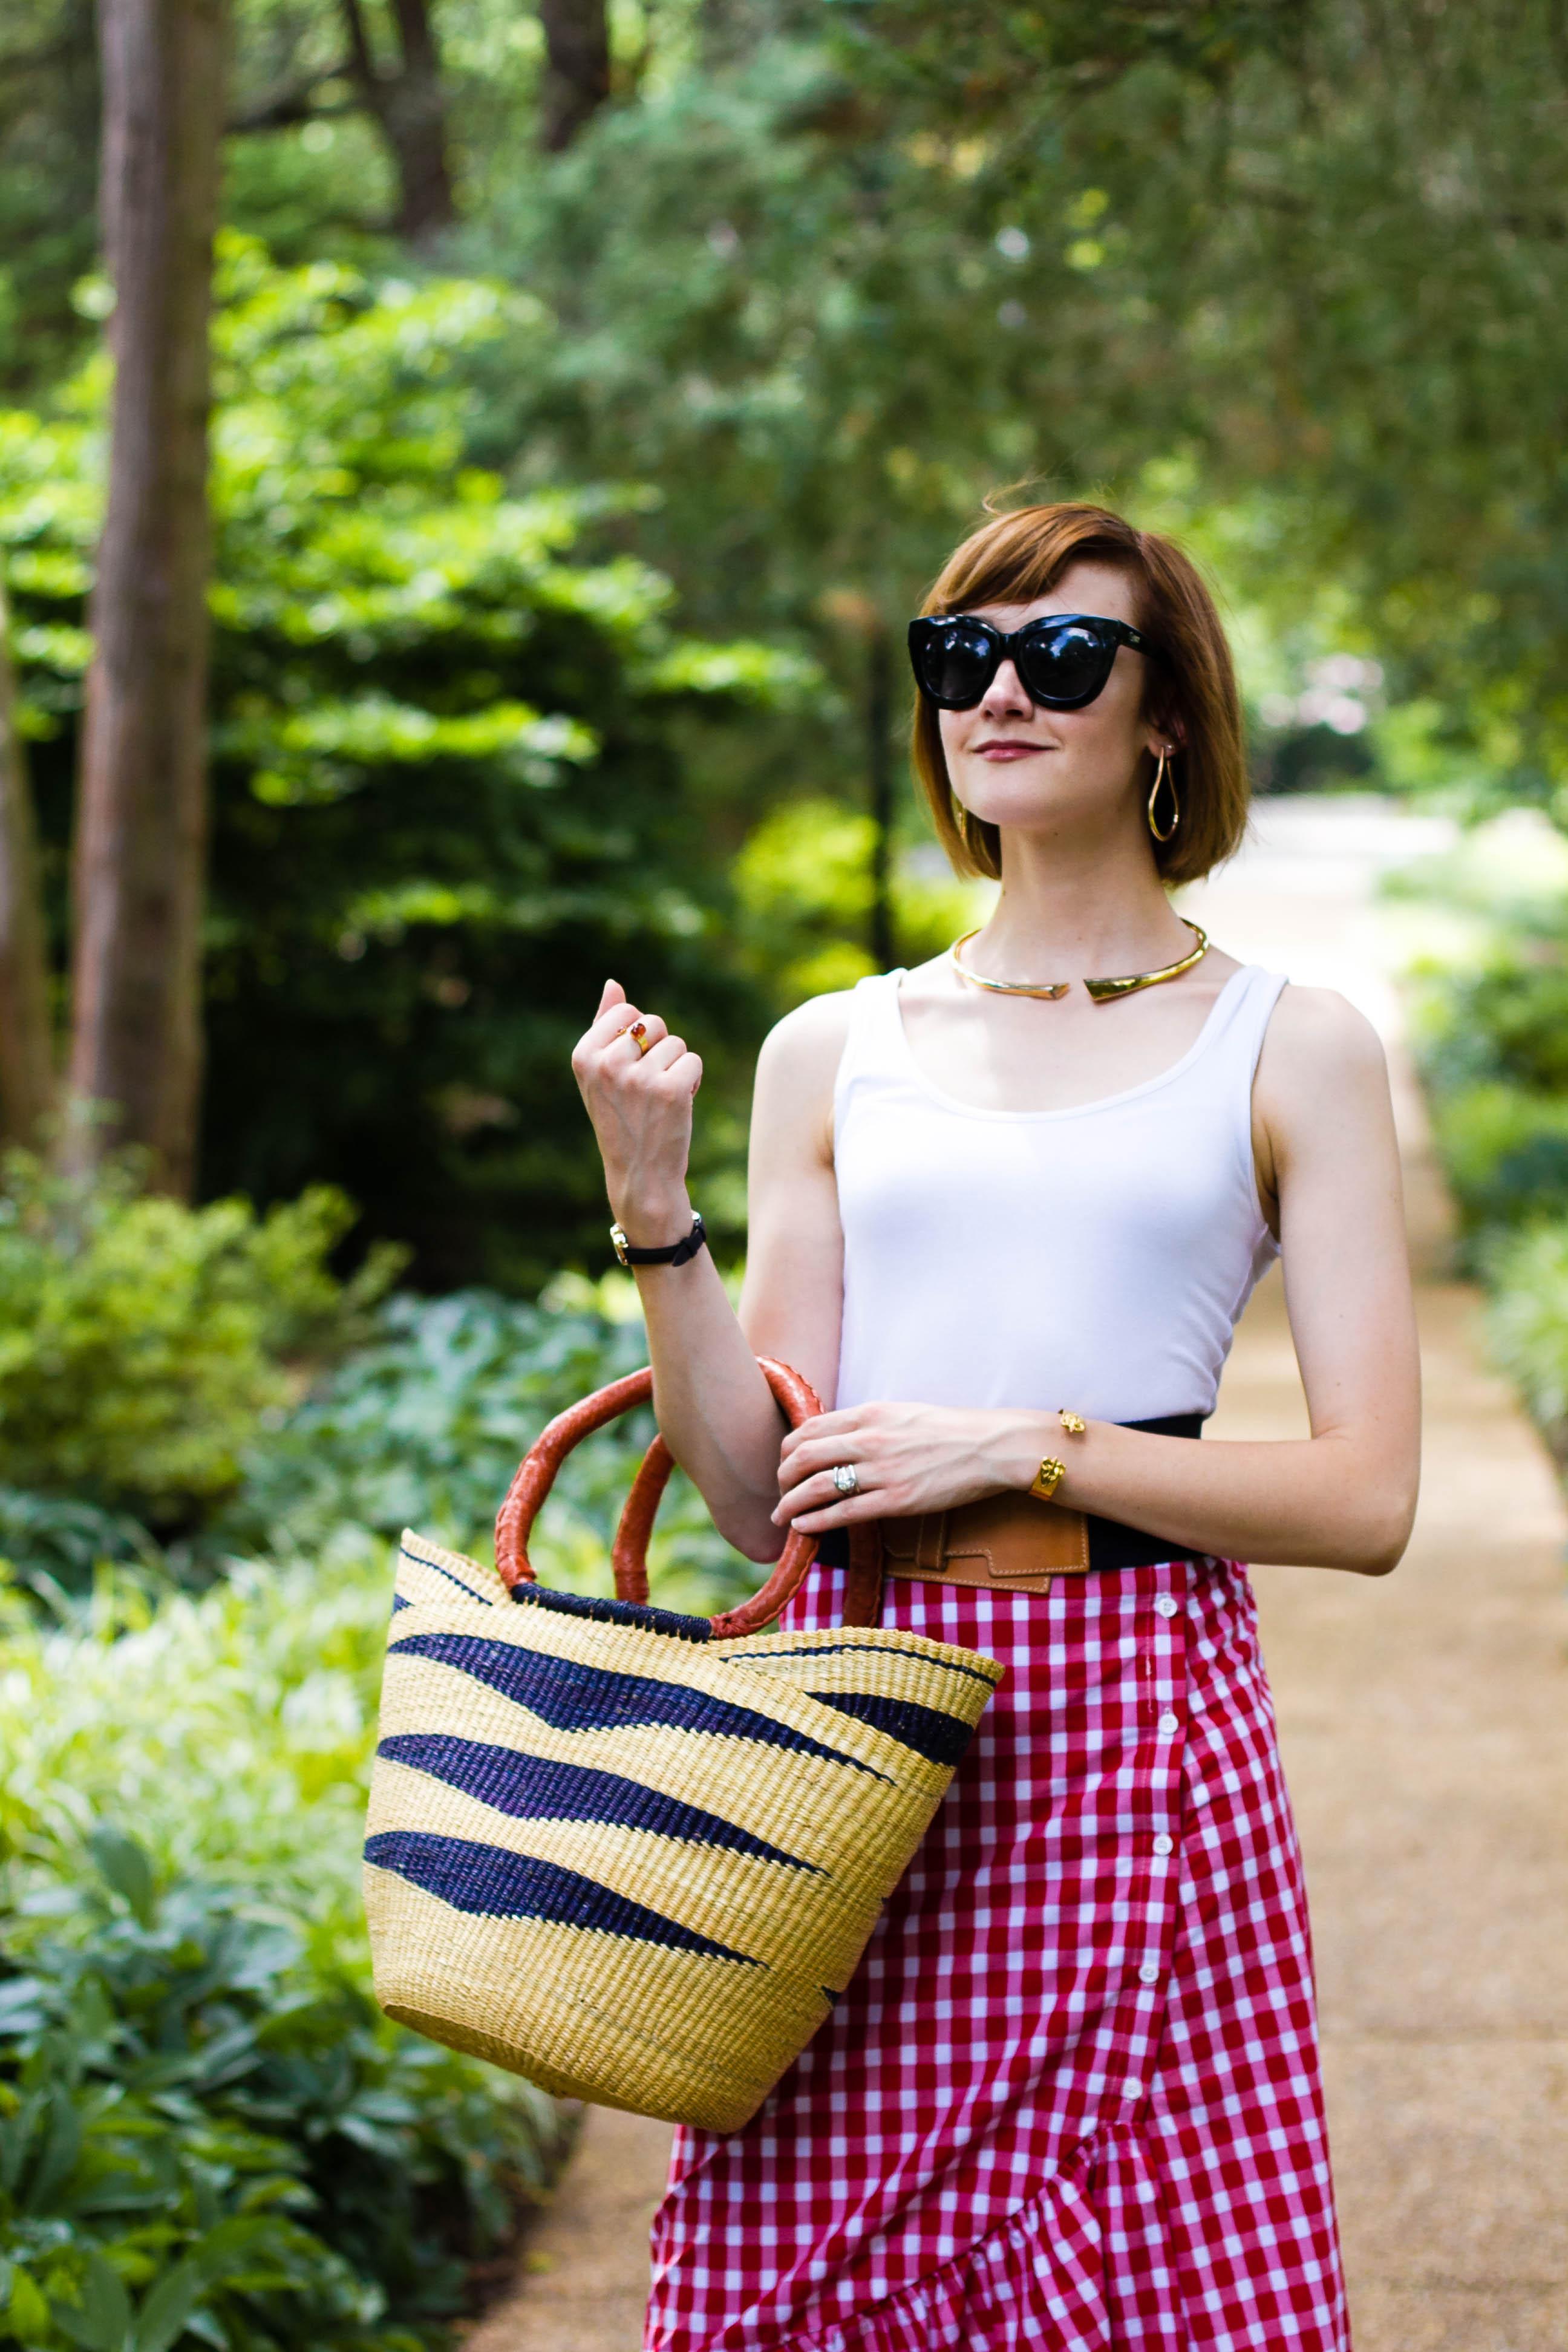 Zara gingham skirt, straw bag, and Tabitha Simmons sandals